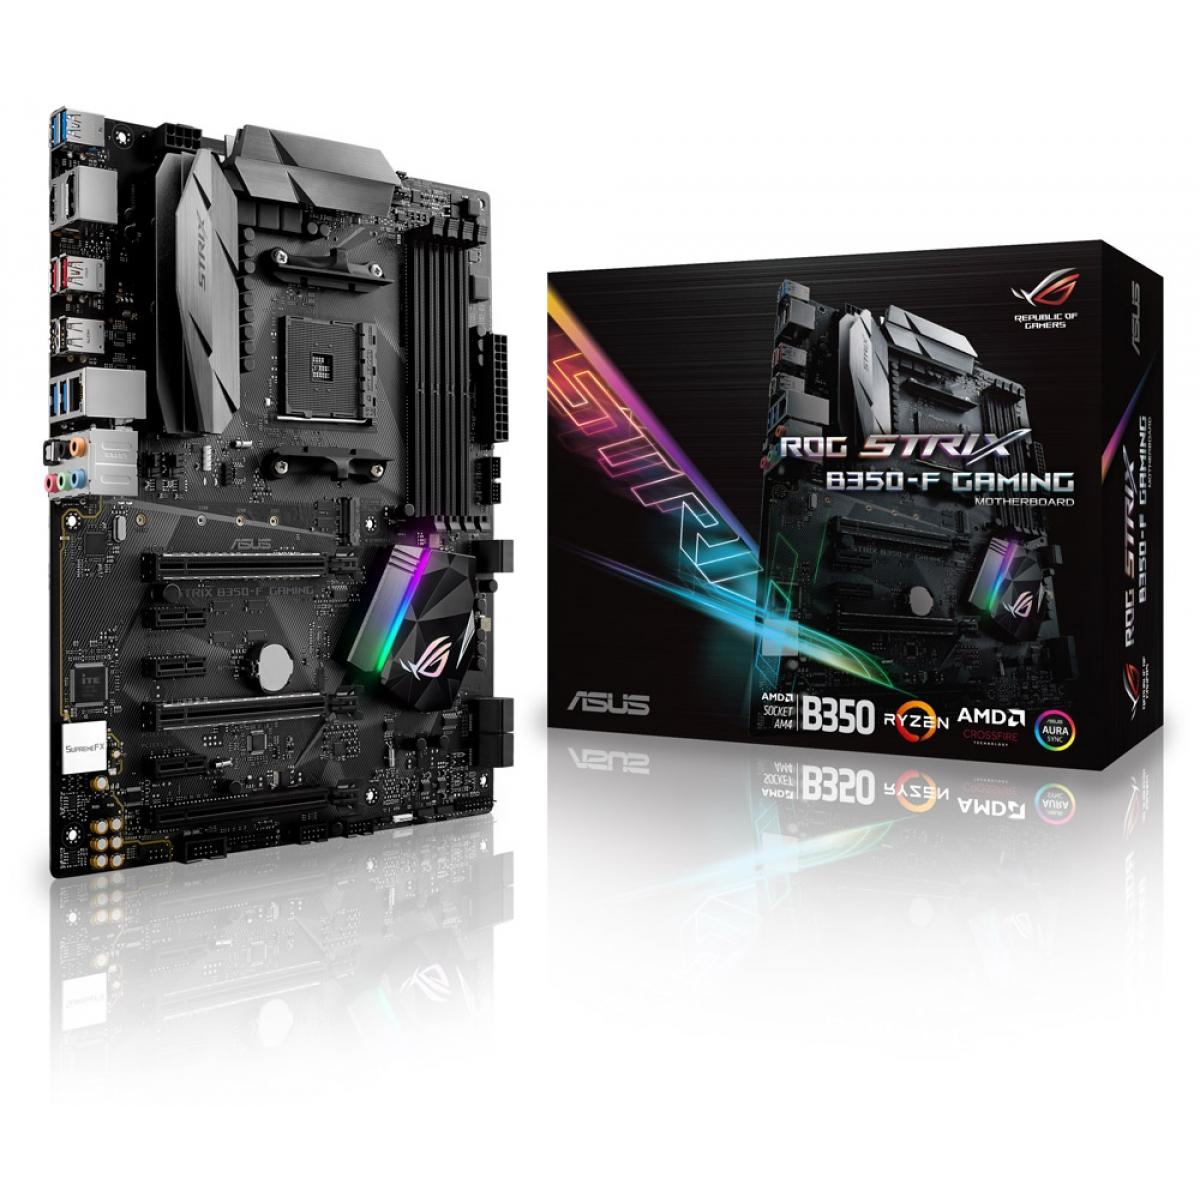 Placa Mãe Asus ROG STRIX B350-F GAMING, Chipset B350, AMD AM4, ATX, DDR4